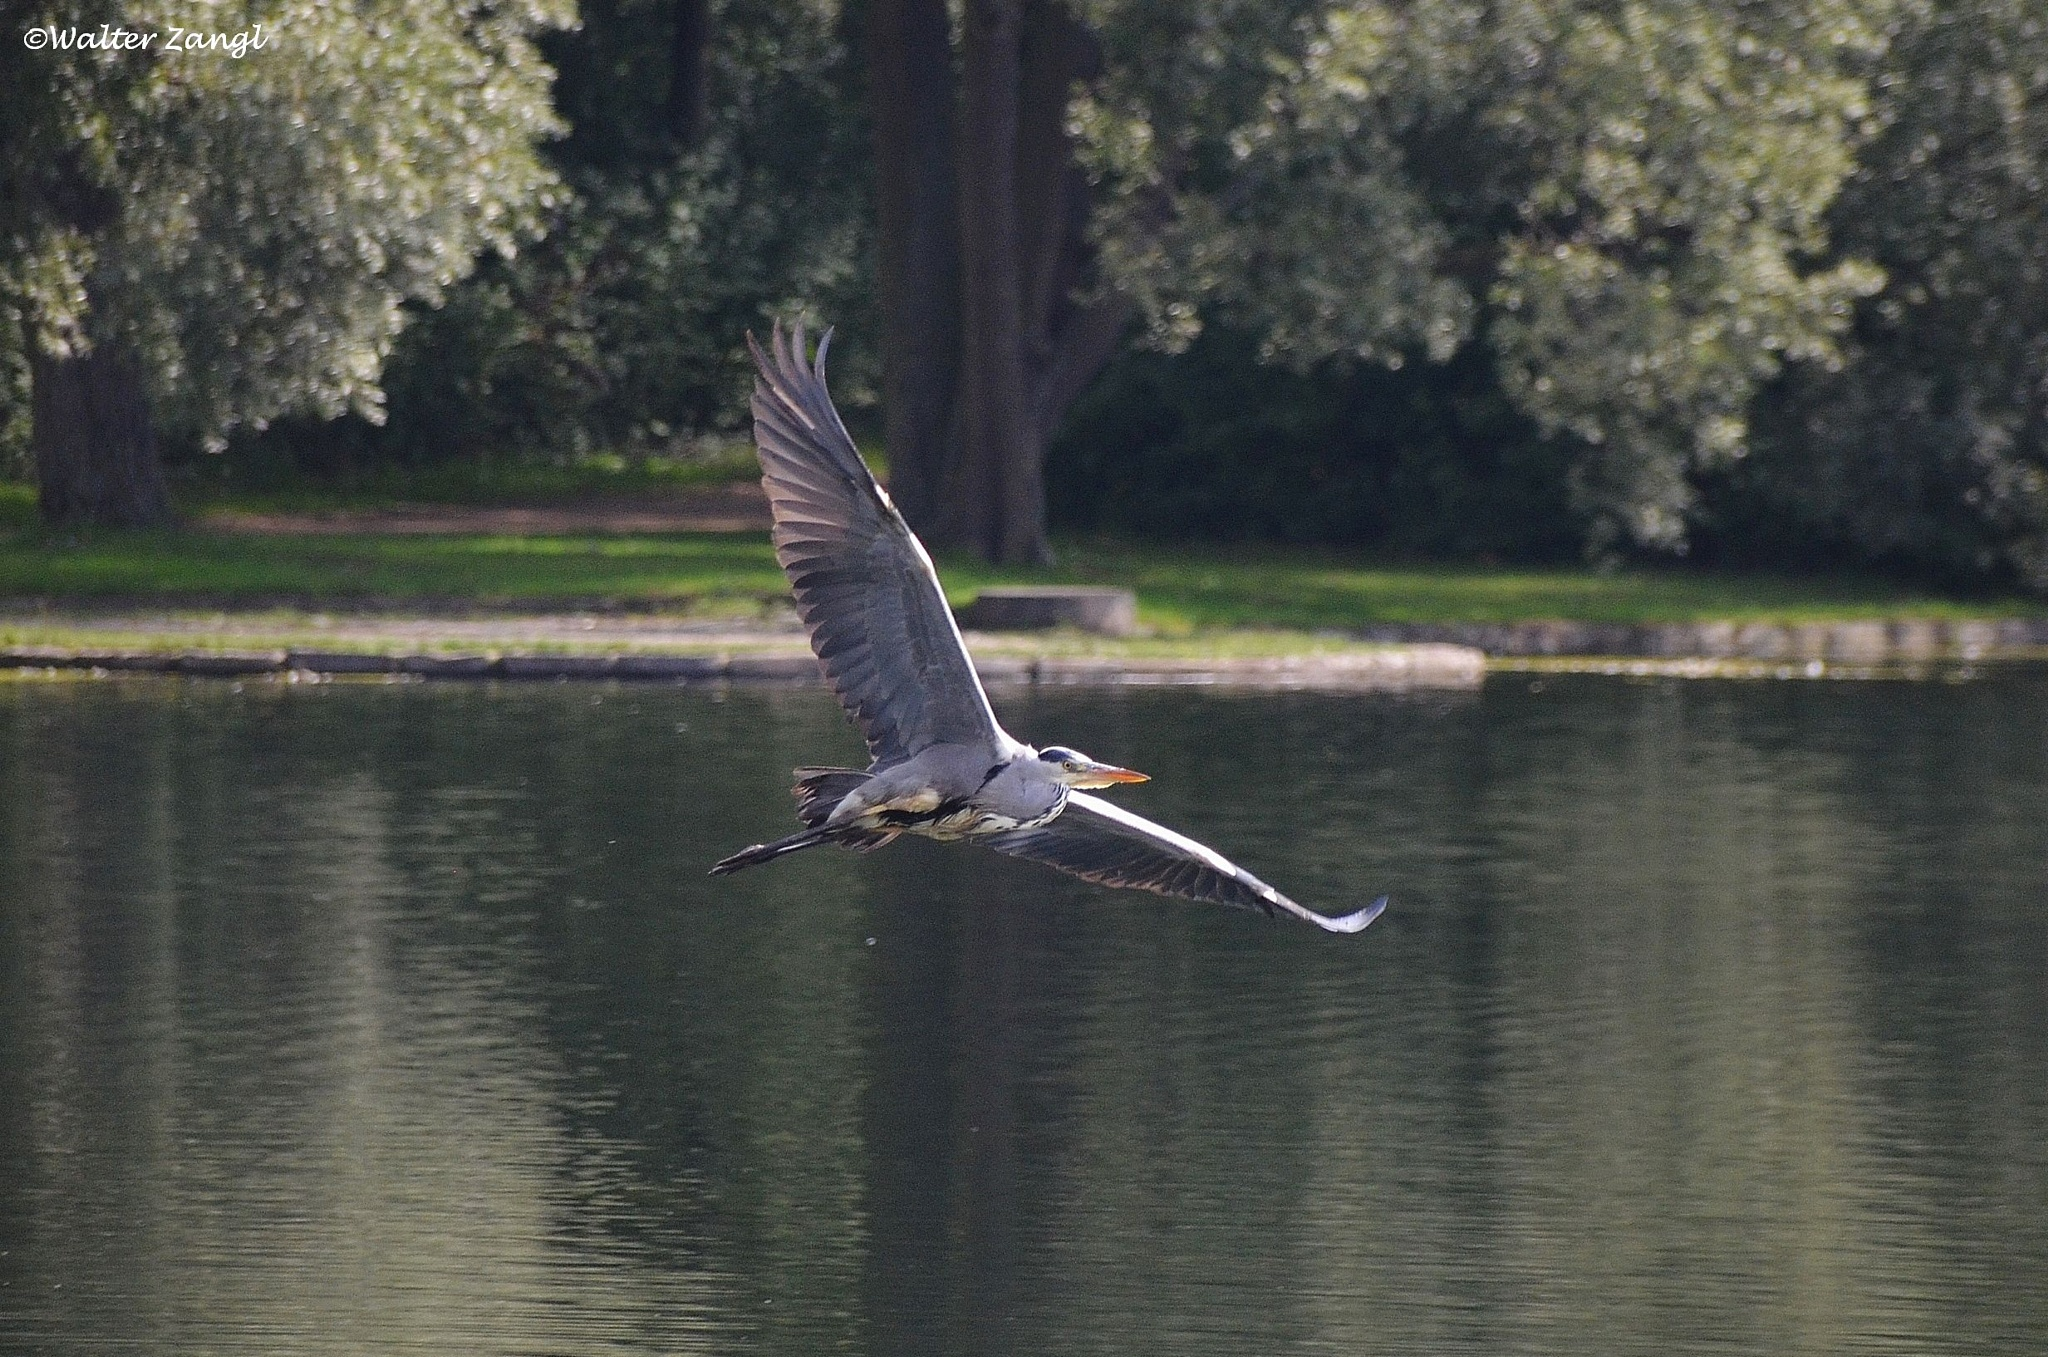 Flying heron by Walter Zangl